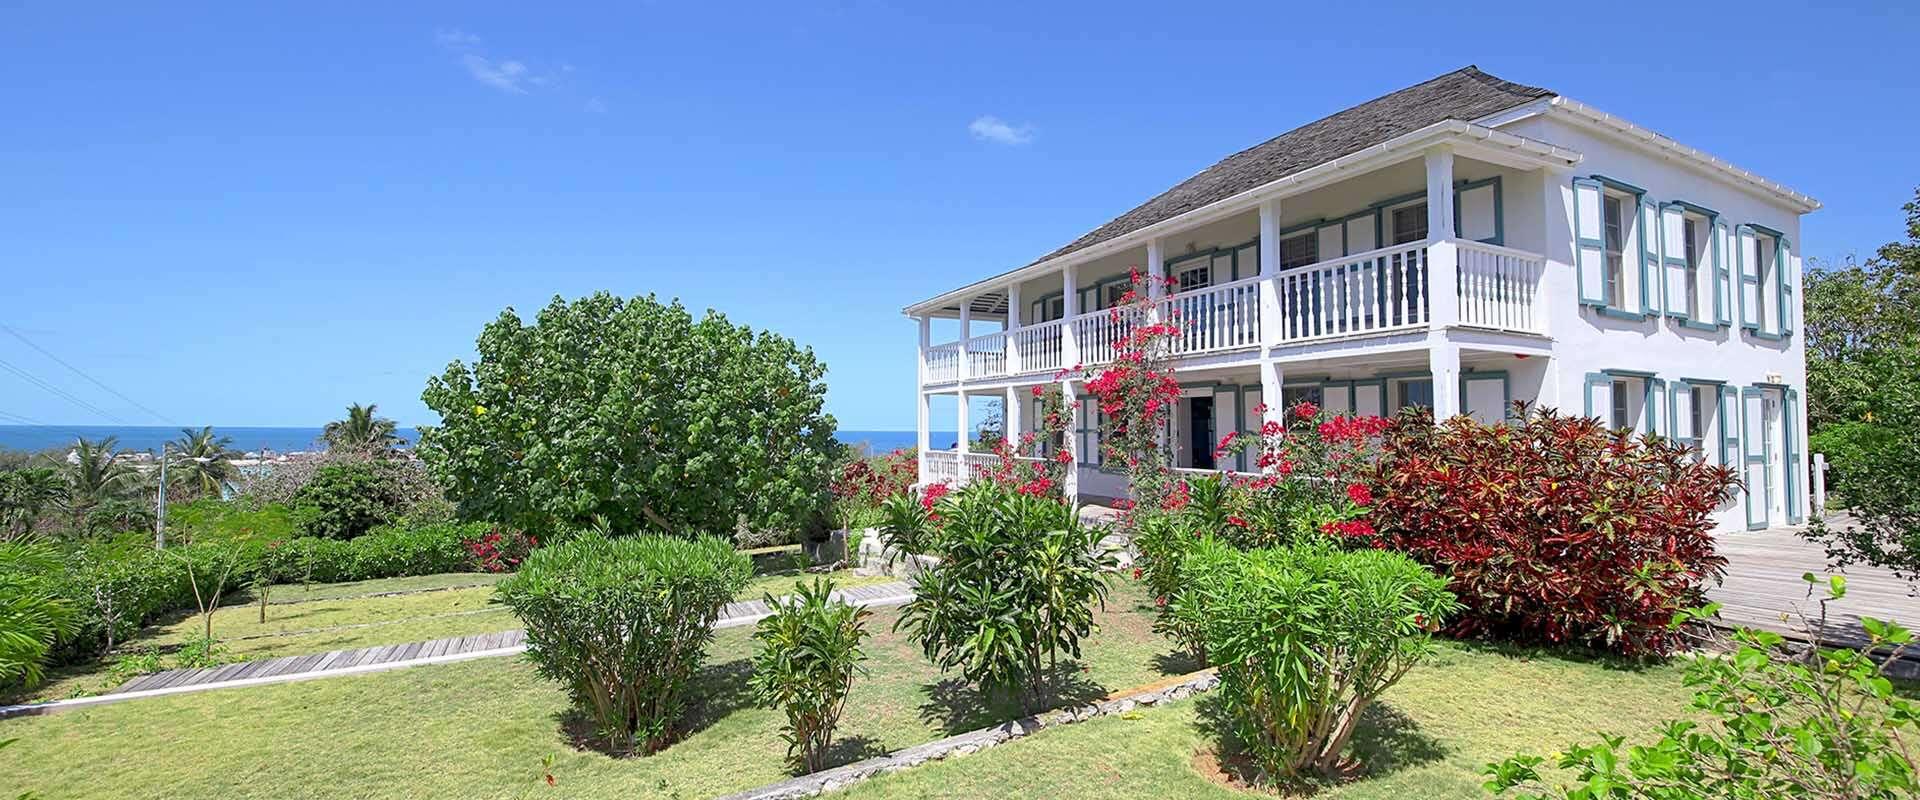 Luxury villa rentals caribbean - Bahamas - Eleuthera - Governors harbour - Belmont House - Image 1/20